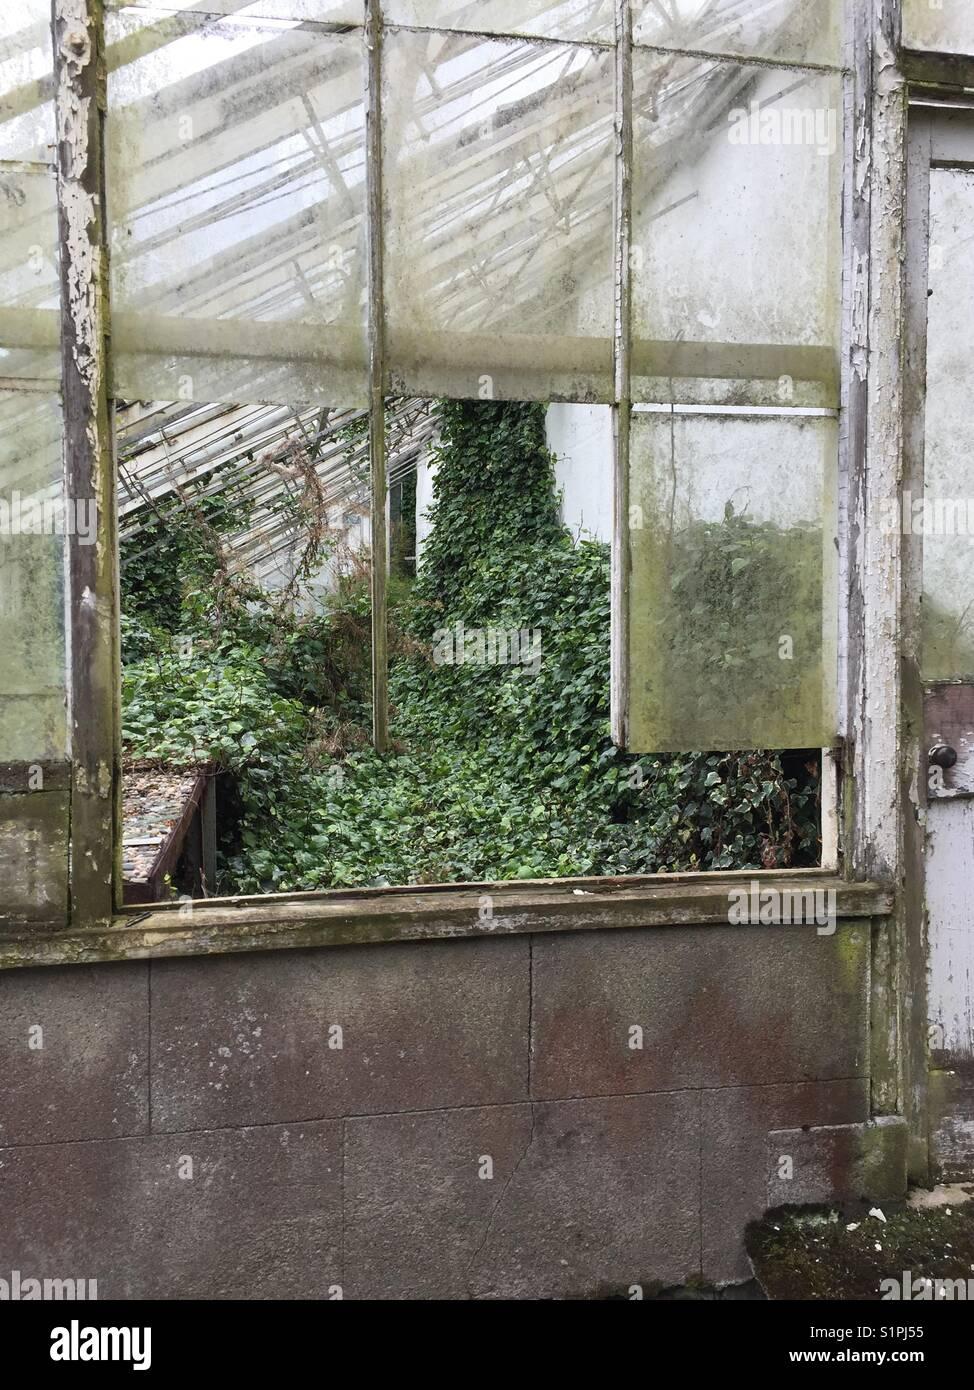 Garden Greenhouse Broken Glass Stockfotos & Garden Greenhouse Broken ...